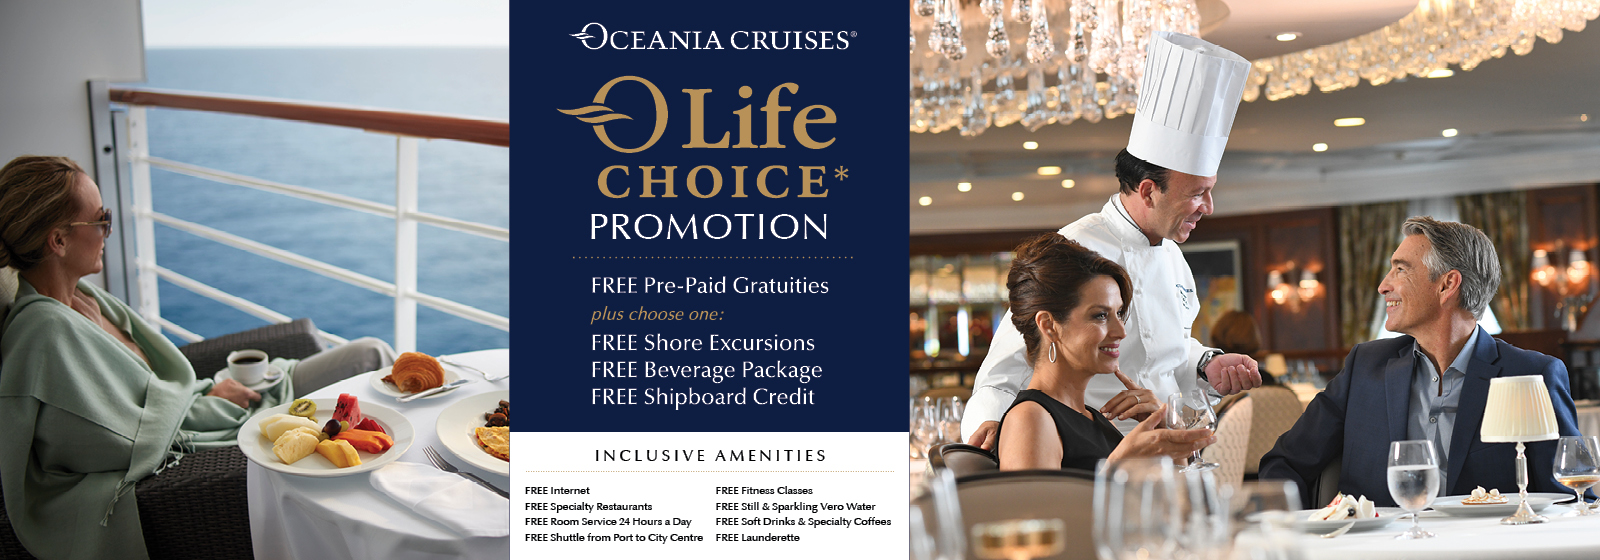 Oceania - OLife Choice Promotion